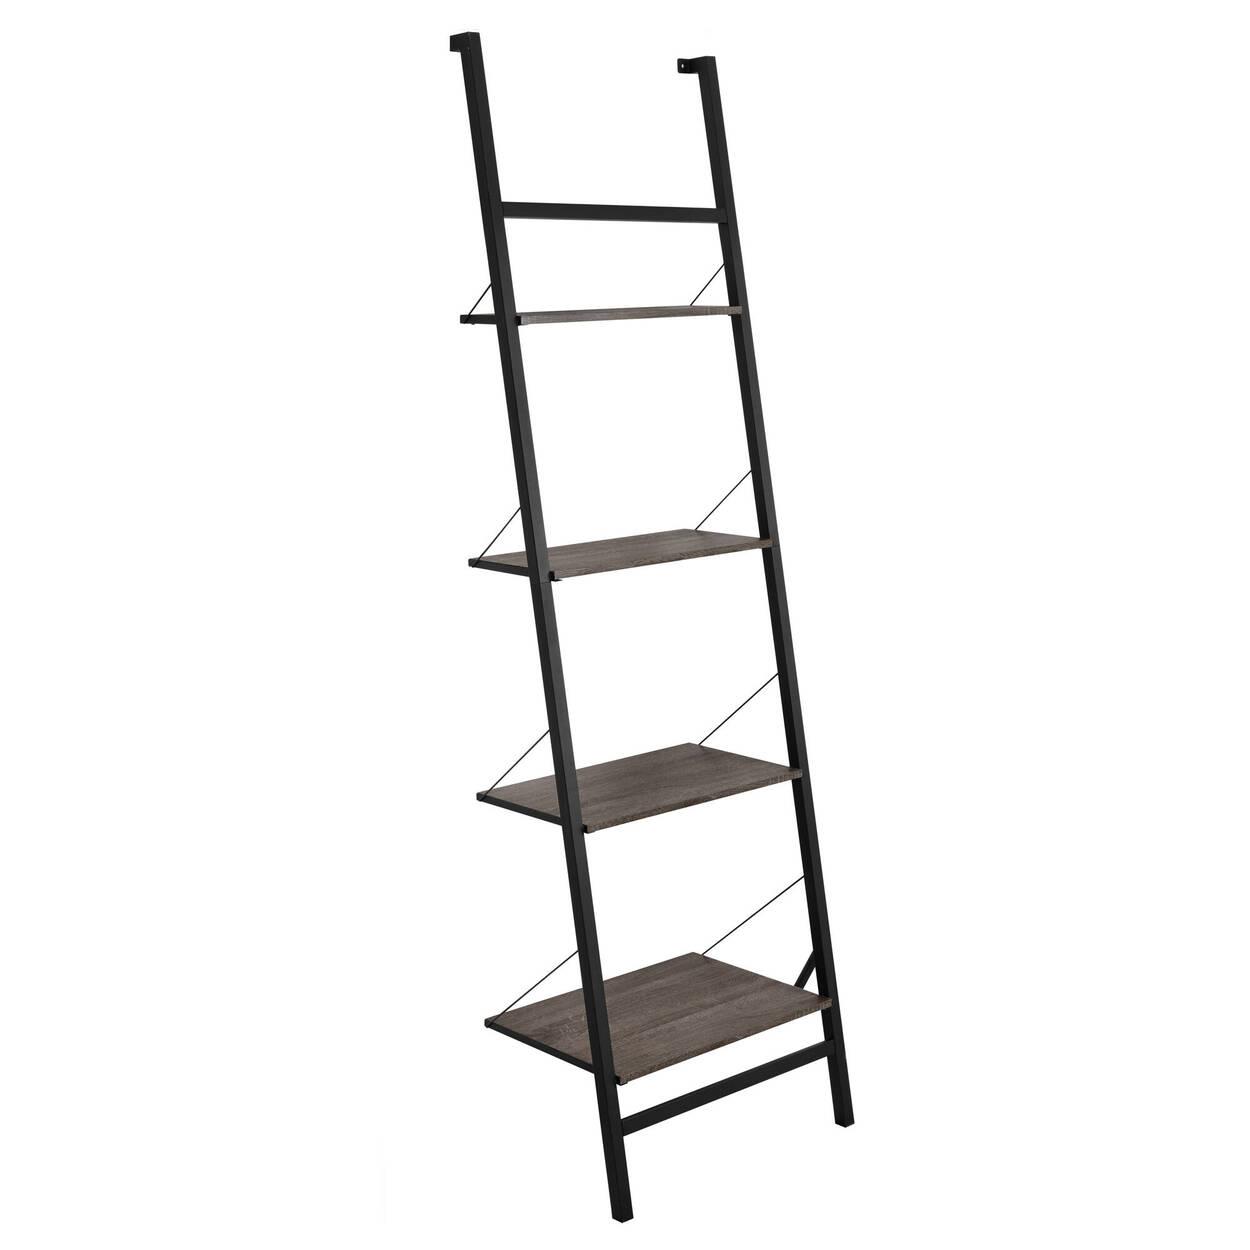 Four-Tier Wall Ladder Shelf